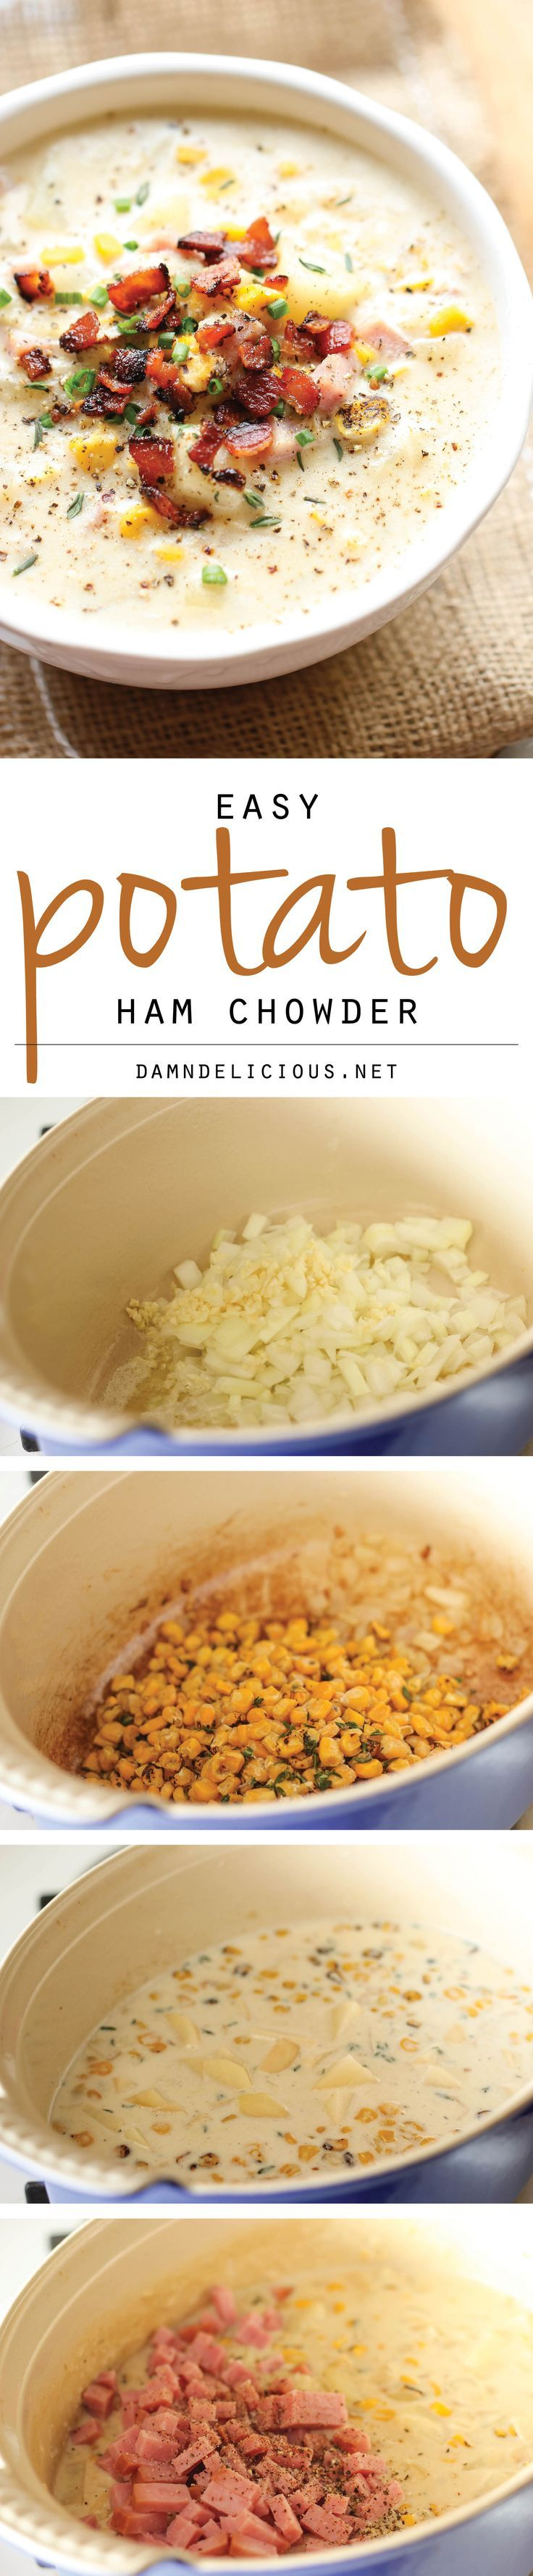 Potato Ham Chowder | Chowders, Hams and Potatoes